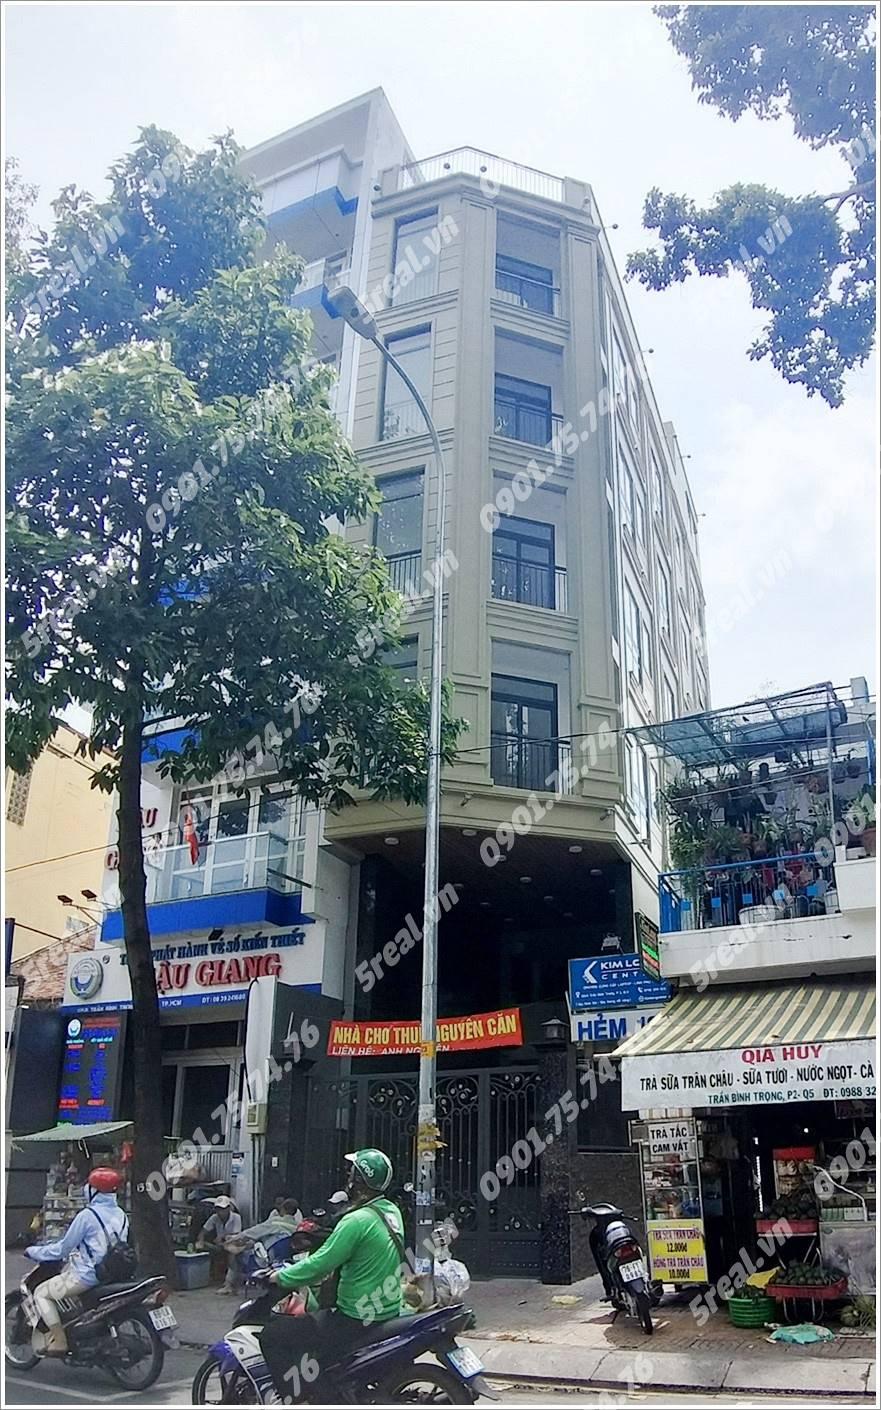 building-125-tran-binh-trong-quan-5-van-phong-cho-thue-5real.vn-01